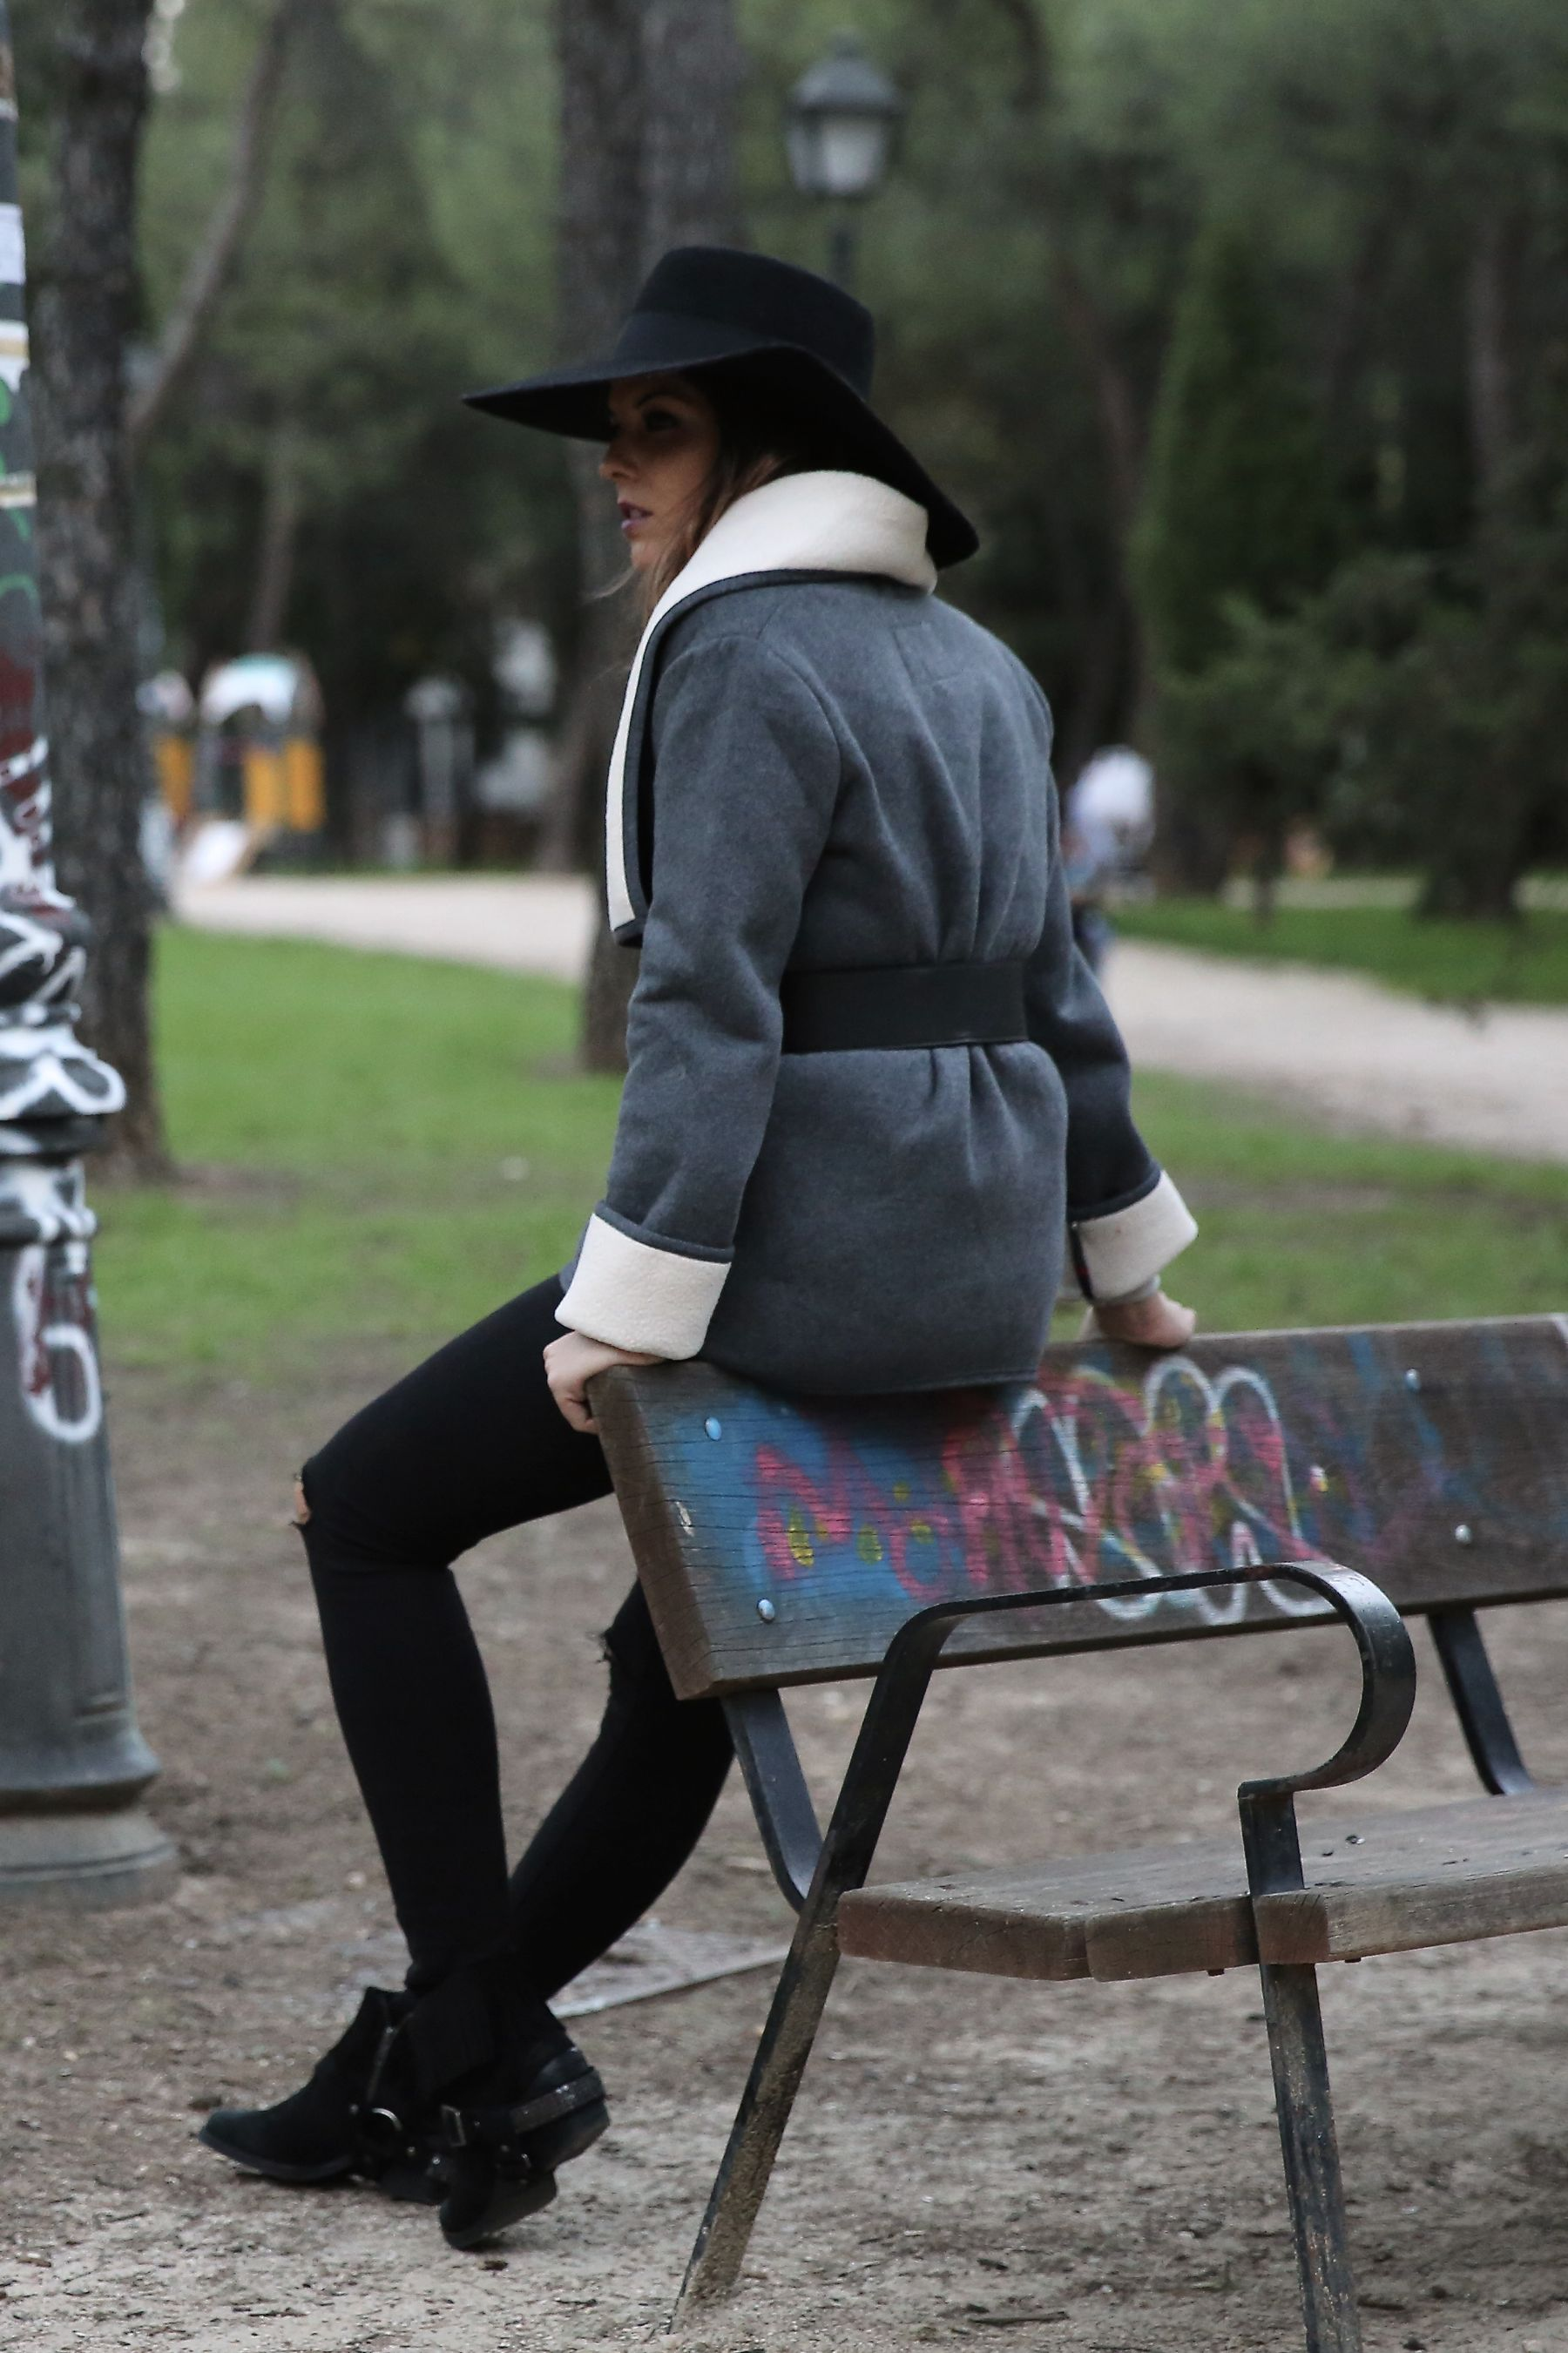 trendy_taste-look-outfit-street_style-ootd-blog-blogger-fashion_spain-moda_españa-abrigo_borrego-borreguillo-otoño-frio-cold-hat-sombrero-boho-hippie-steve_madden-skinny_jeans-pitillos-fall-7